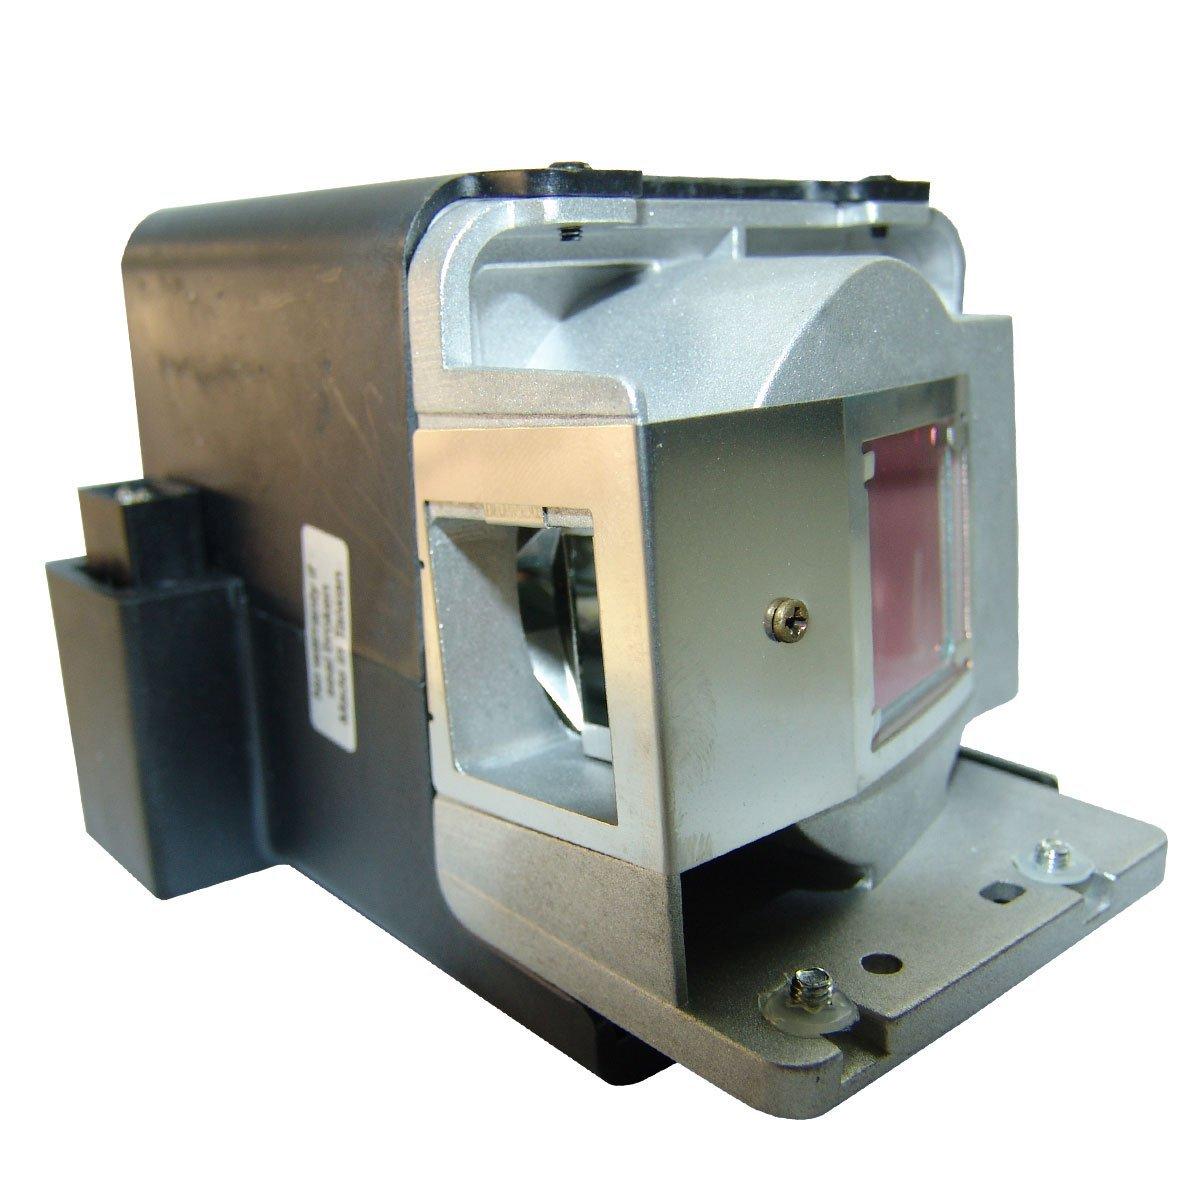 5J.J3S05.001 for BenQ MS510 MW512 MX511 Projector Bulb with housing original projector lamp with housing 5j j3s05 001 for benq ms510 mw512 mx511 mw51